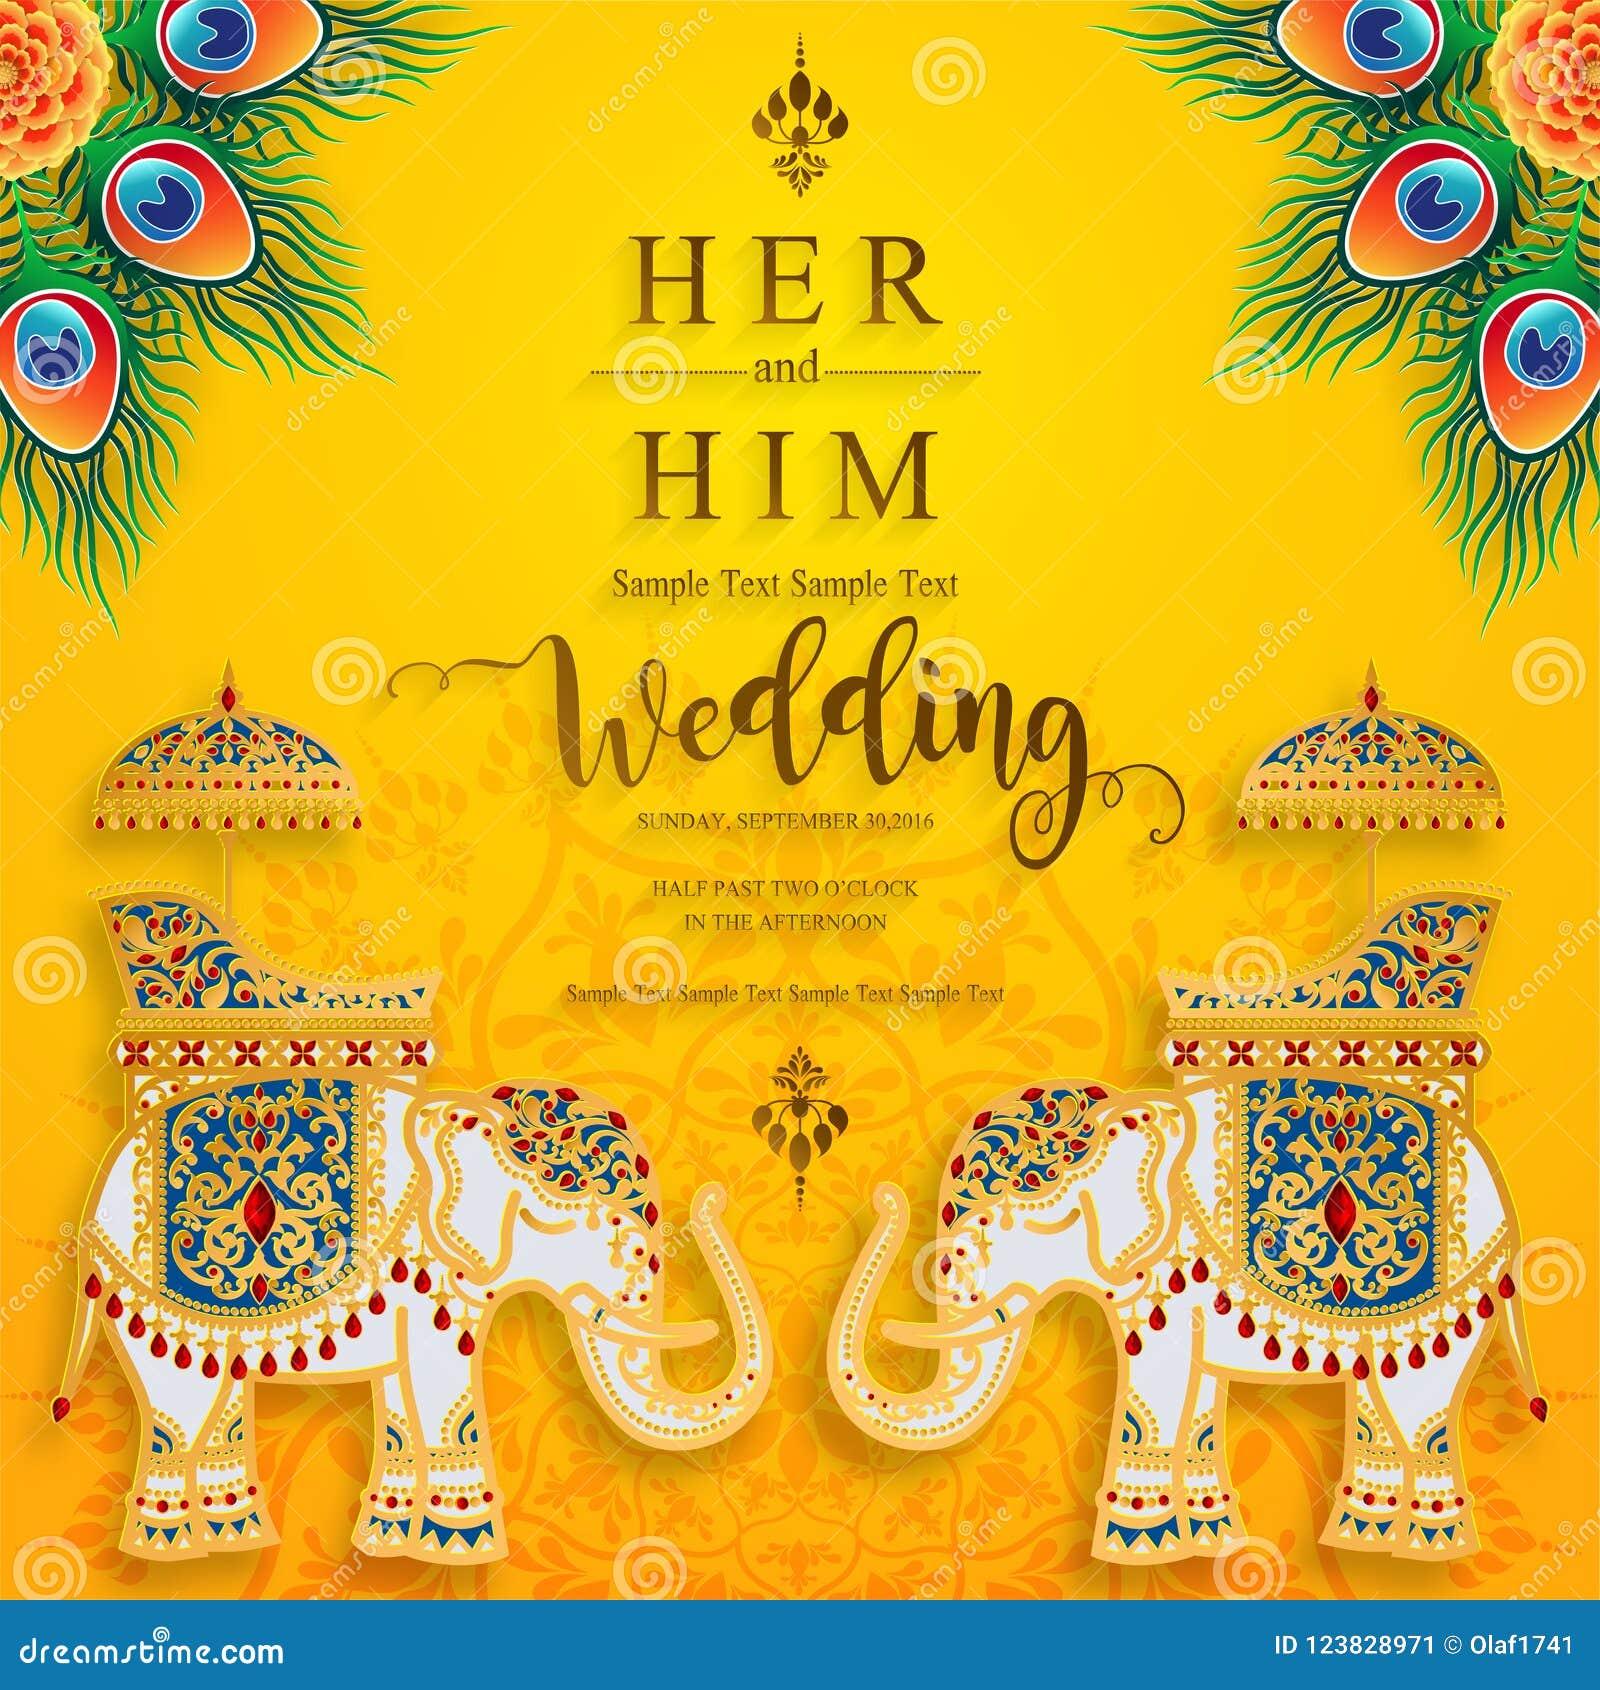 Inindian Wedding Invitation Carddian Wedding Invitation Card